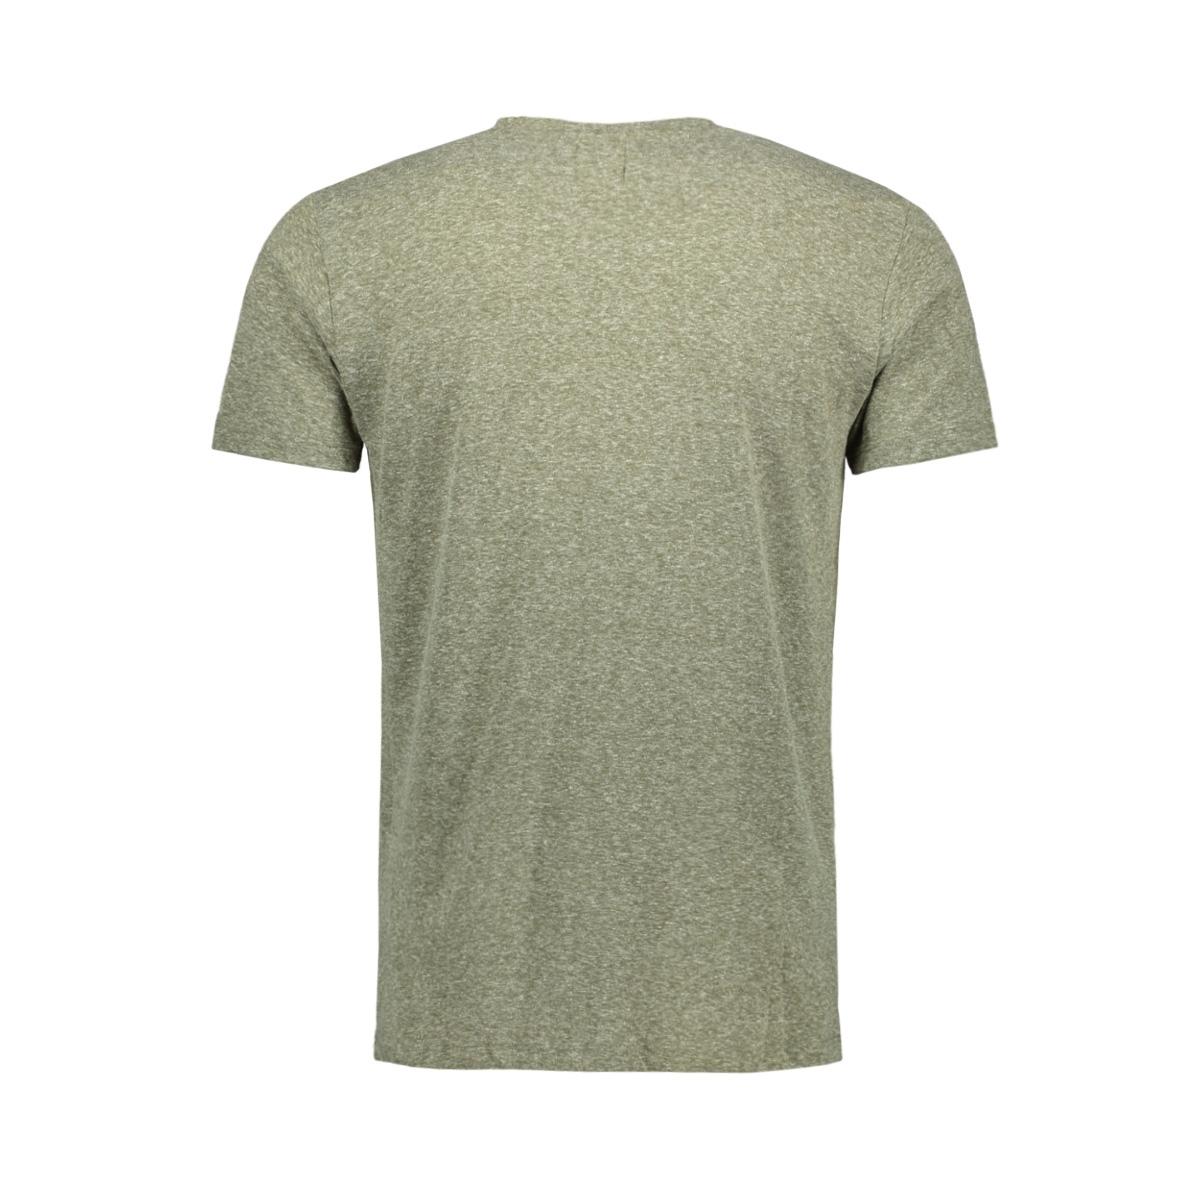 t shirt met korte mouwen gs910701 garcia t-shirt 2088 kalamata